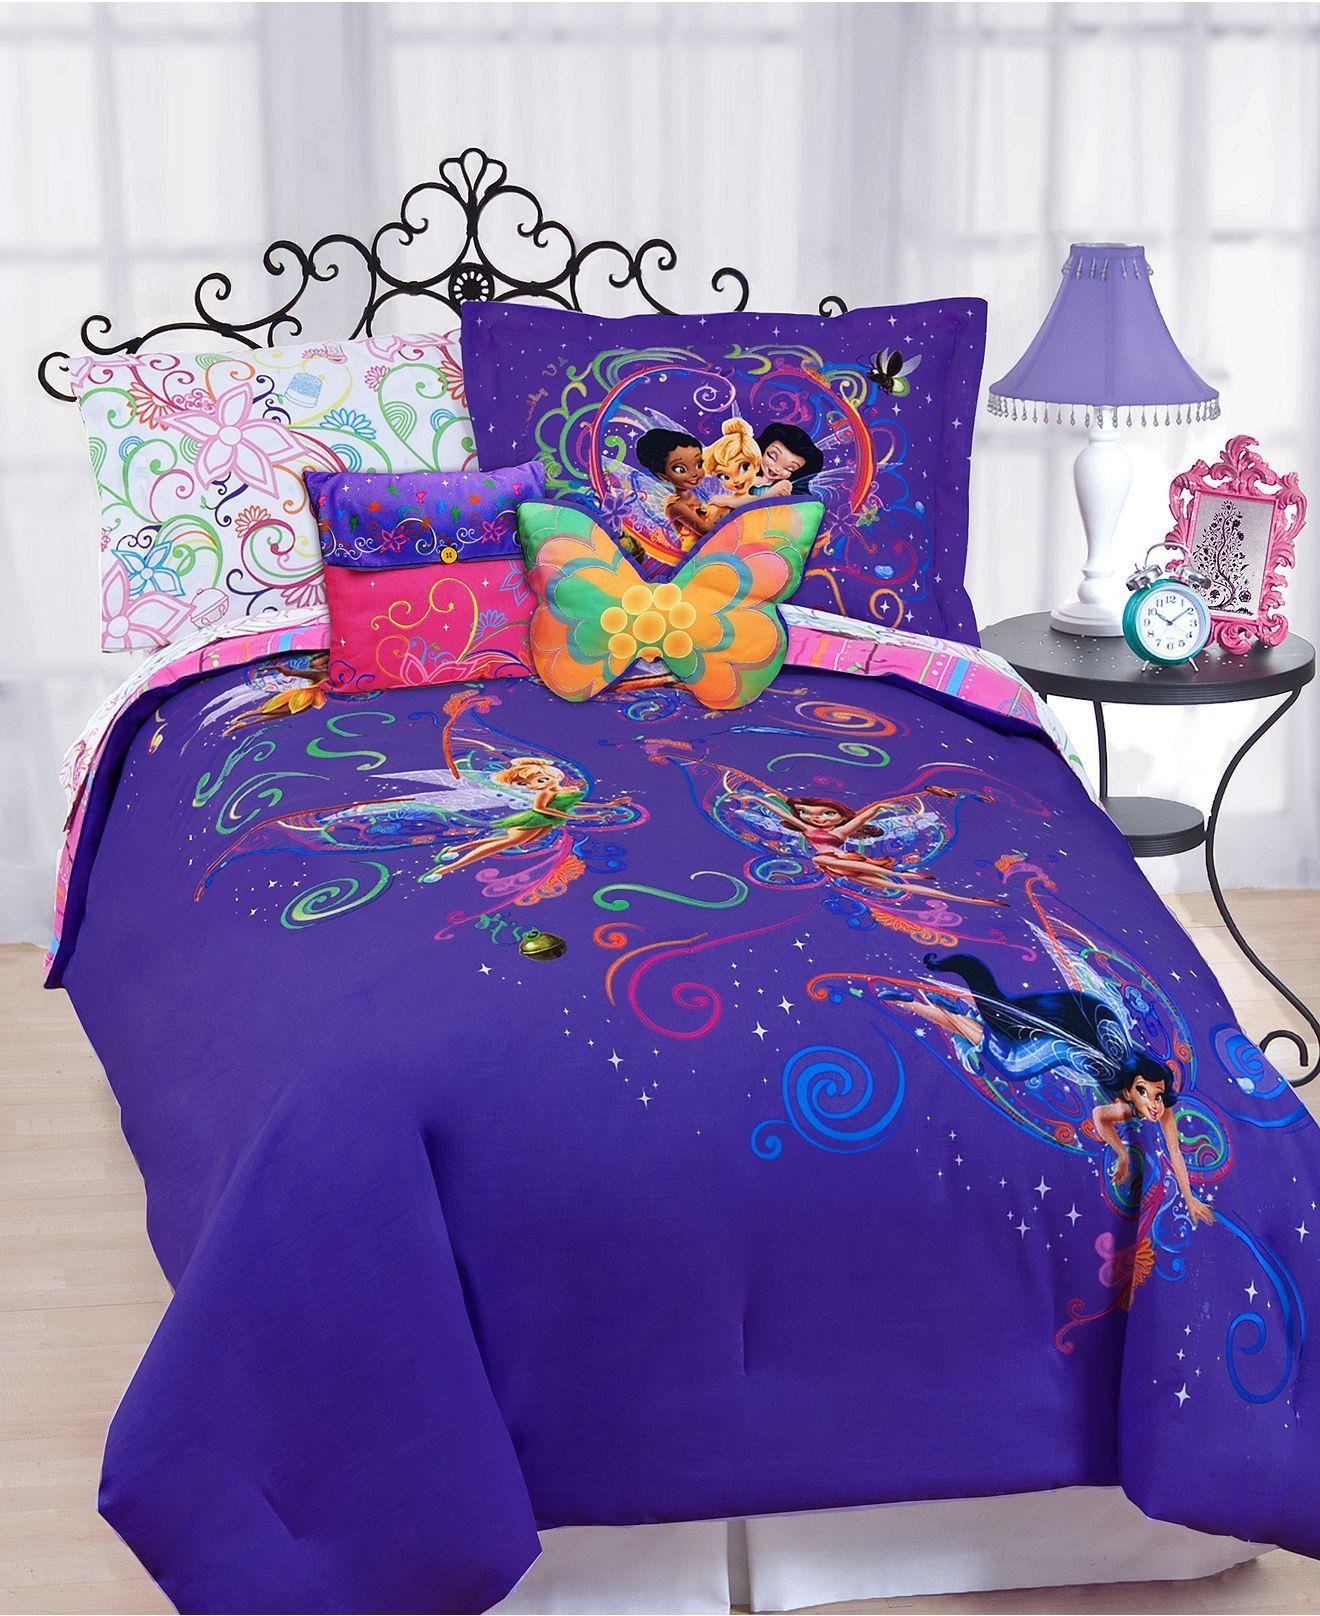 bedding disney fairies tinkerbell twin comforter sets bedding sets